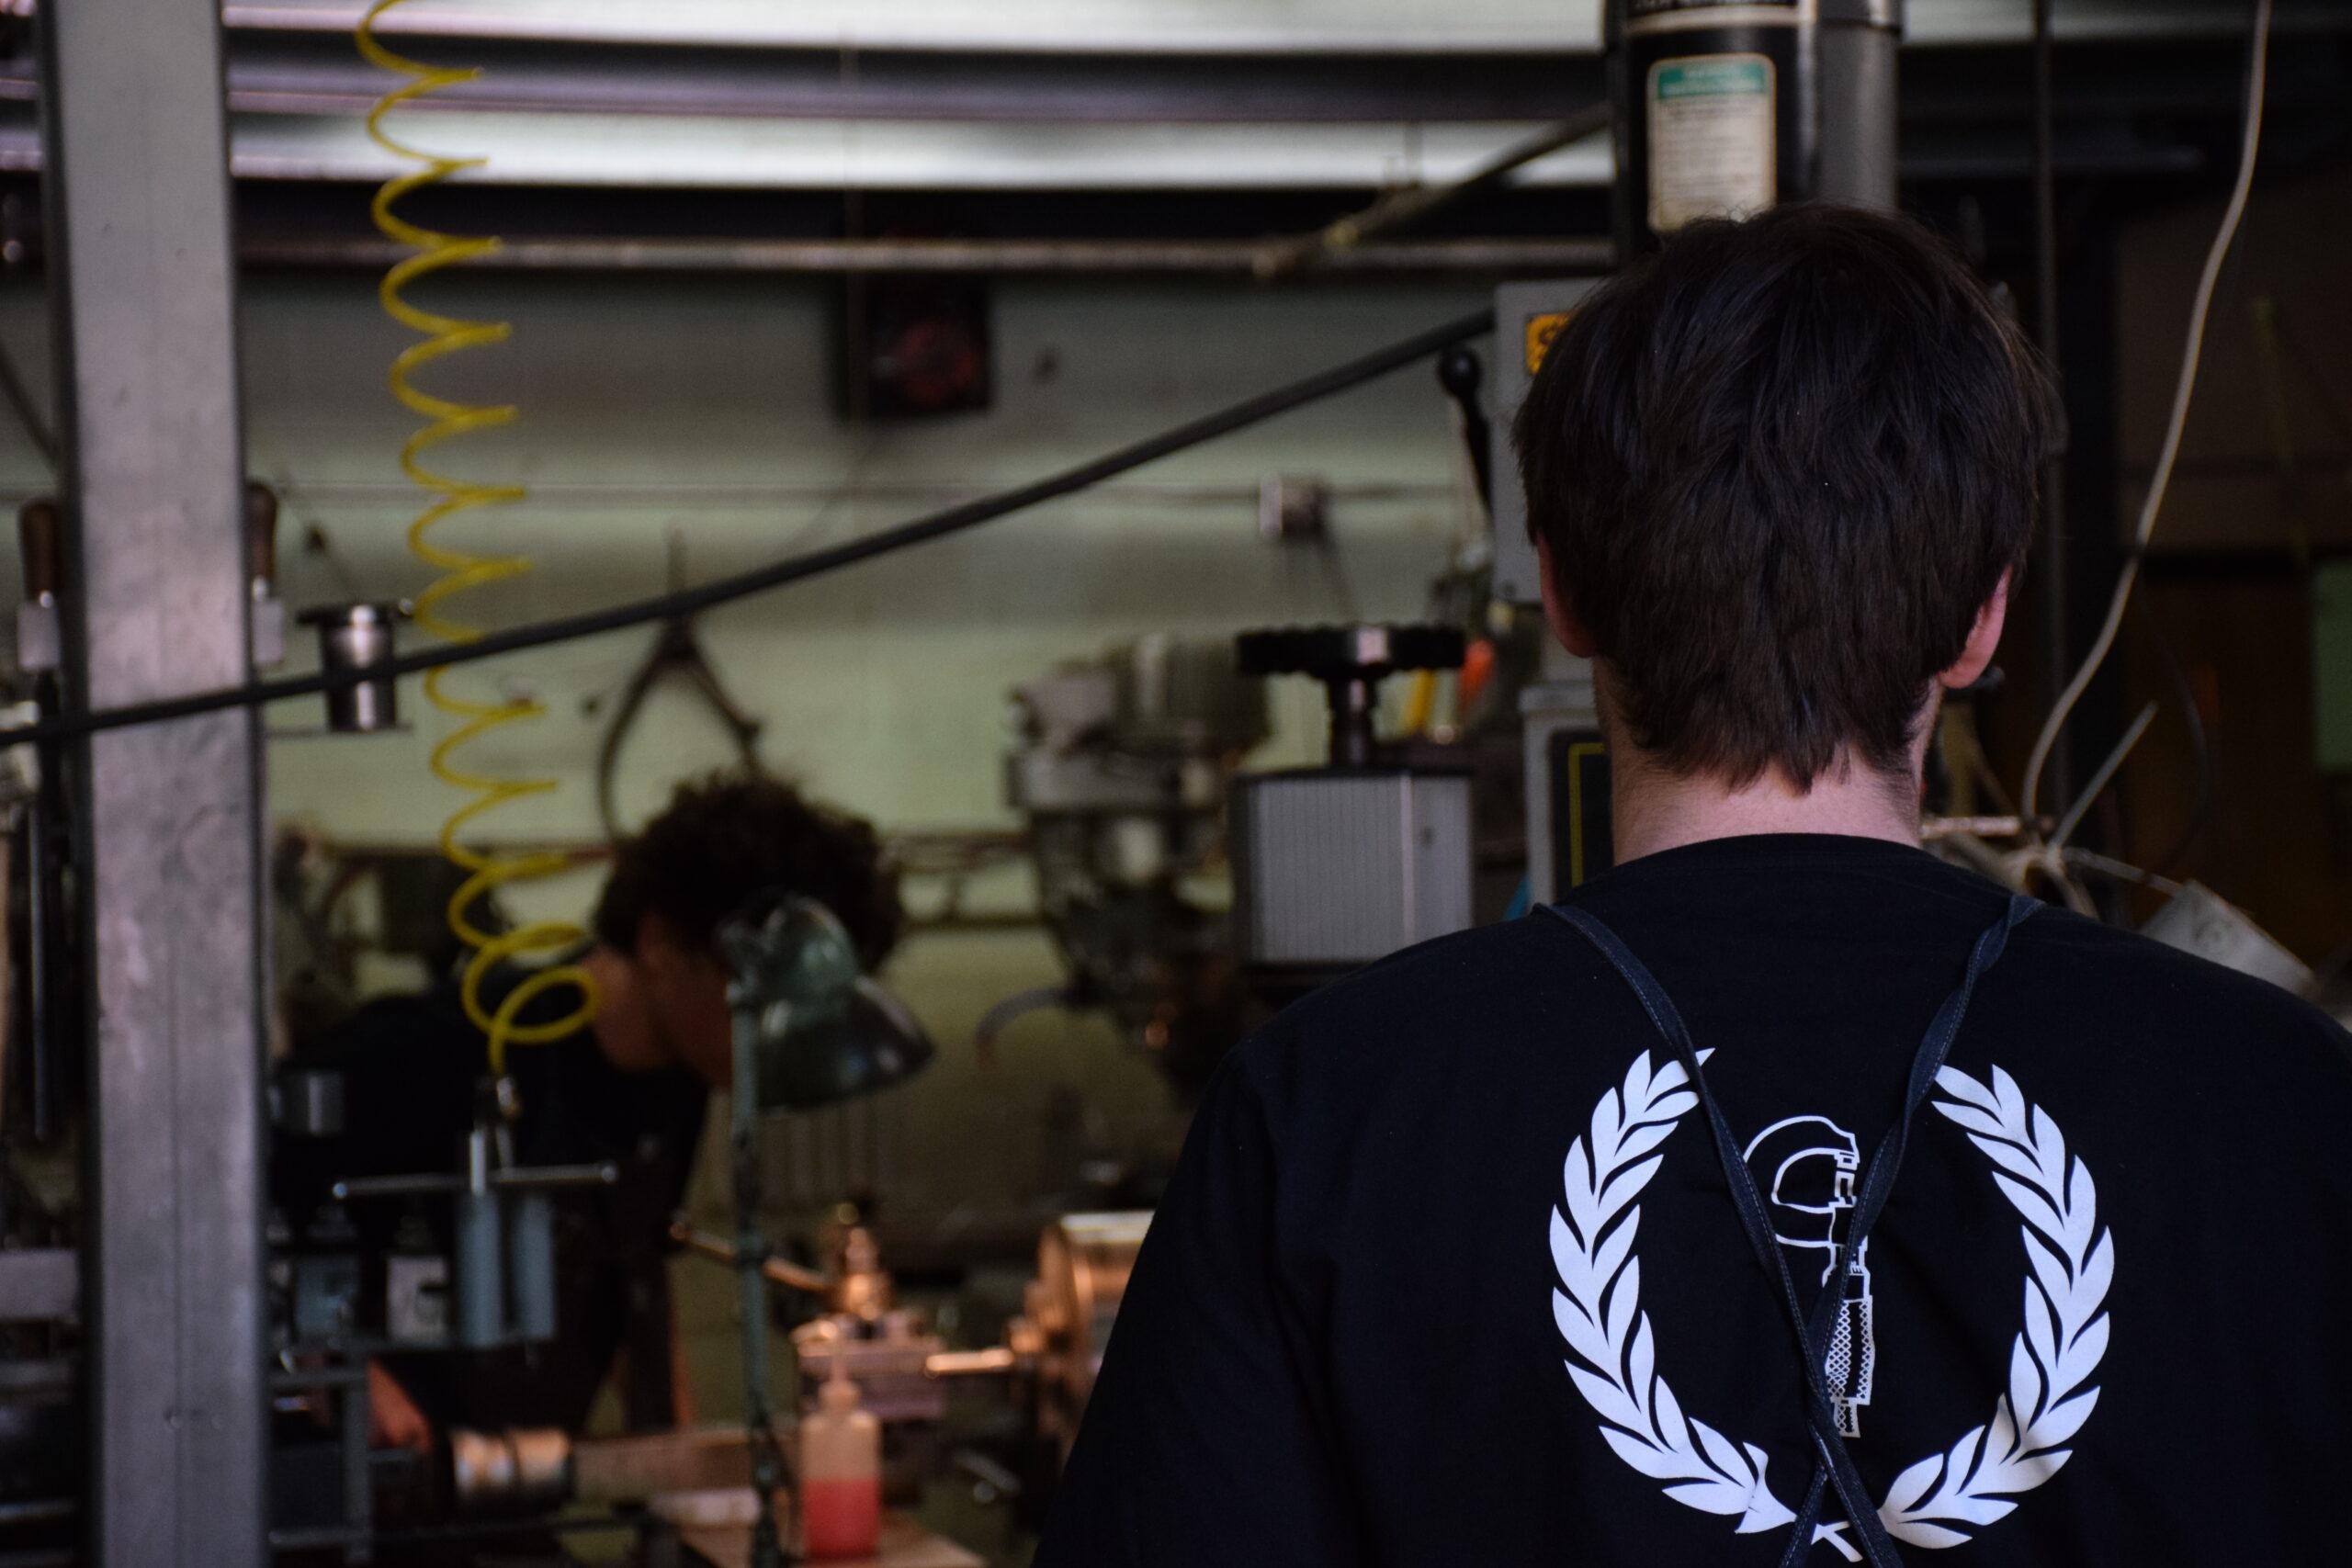 Logan viewing manual machinist using lathe